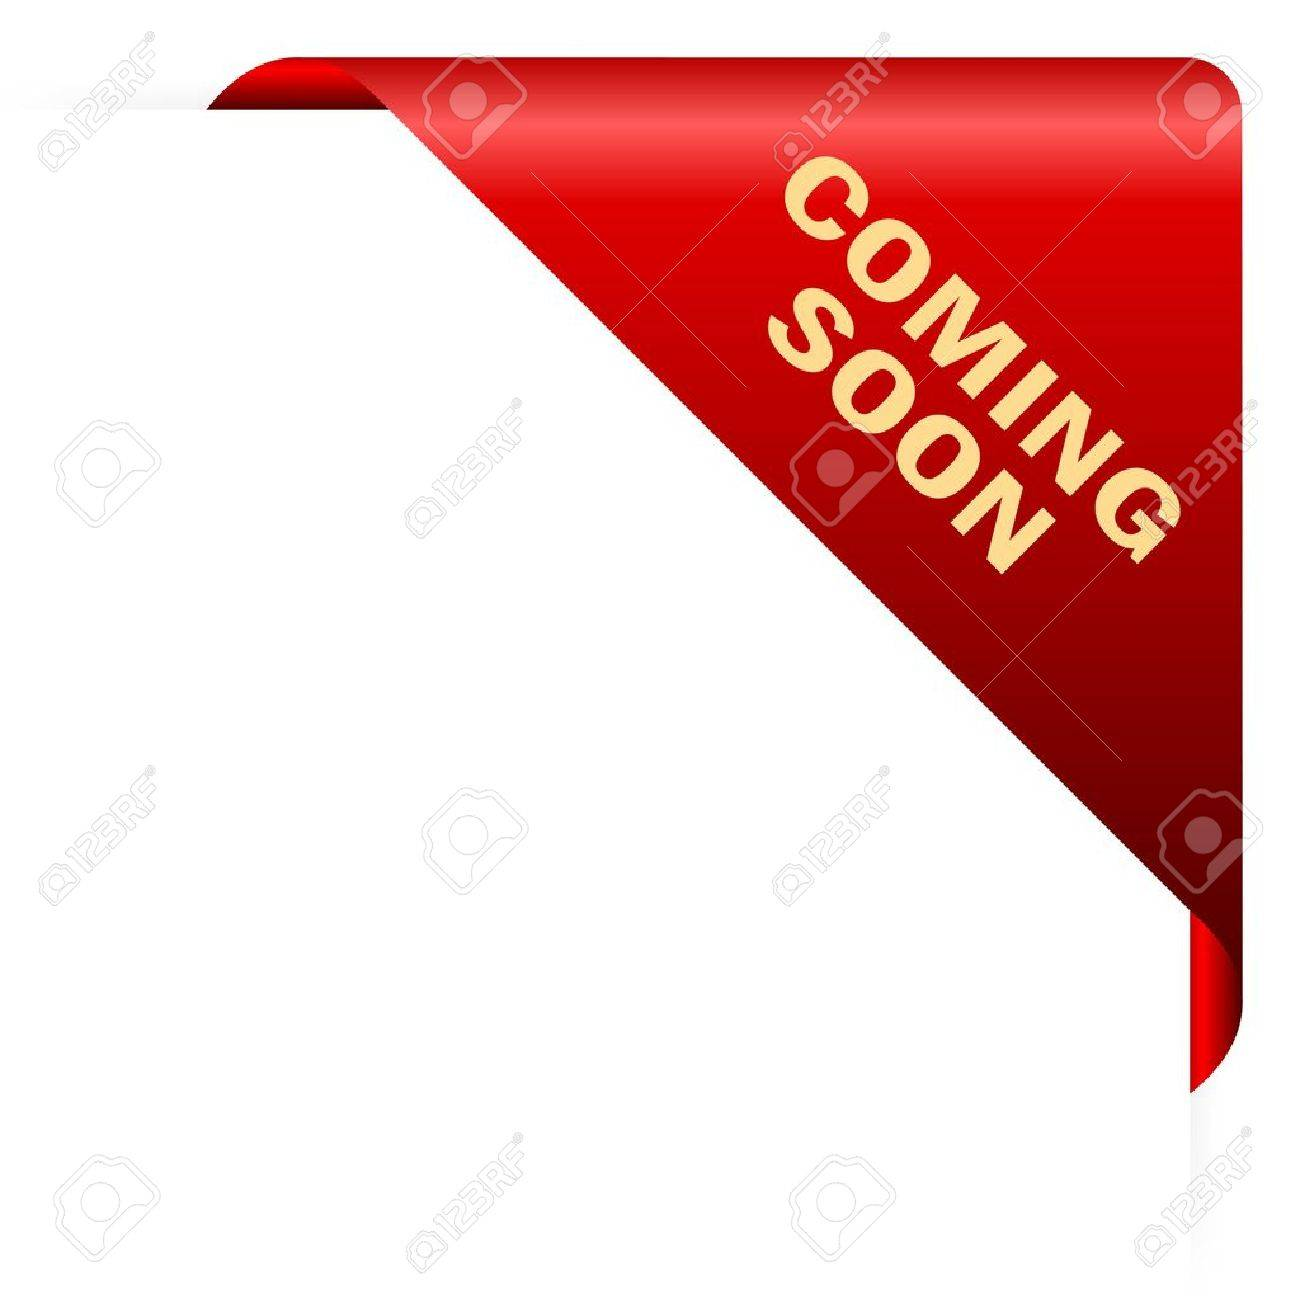 coming soon illustration - 12414973